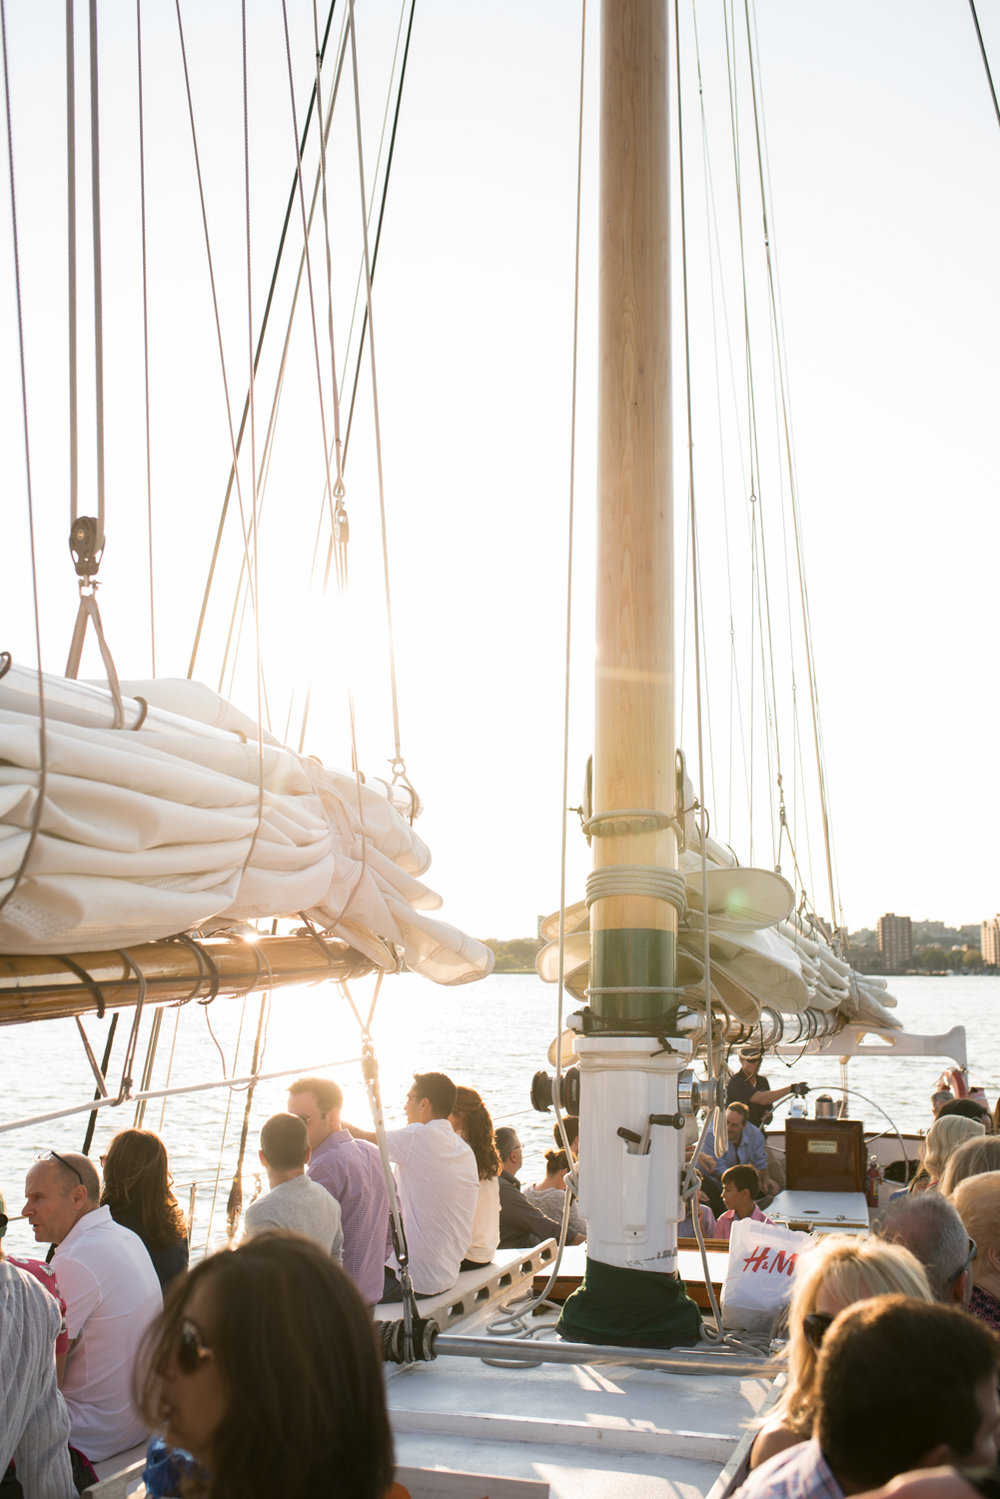 Mike's 50th Birthday- Adirondack Cruise on Hudson River- New York City- Olivia Christina Photo-20.JPG